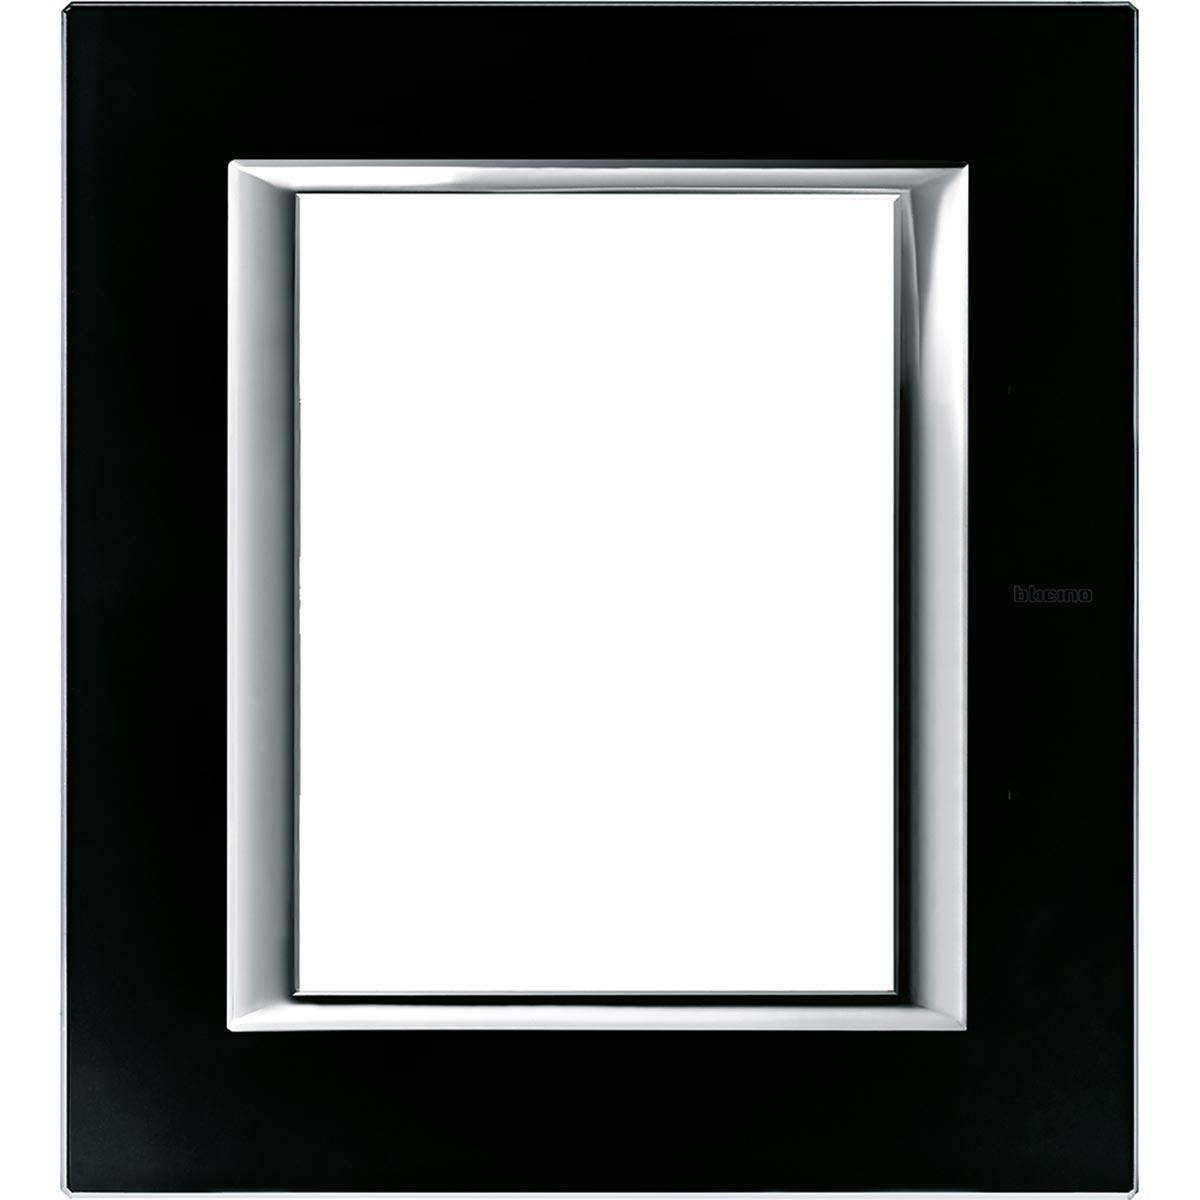 HA4826VNN axolute bticino placche vetro nero notte 6 posti